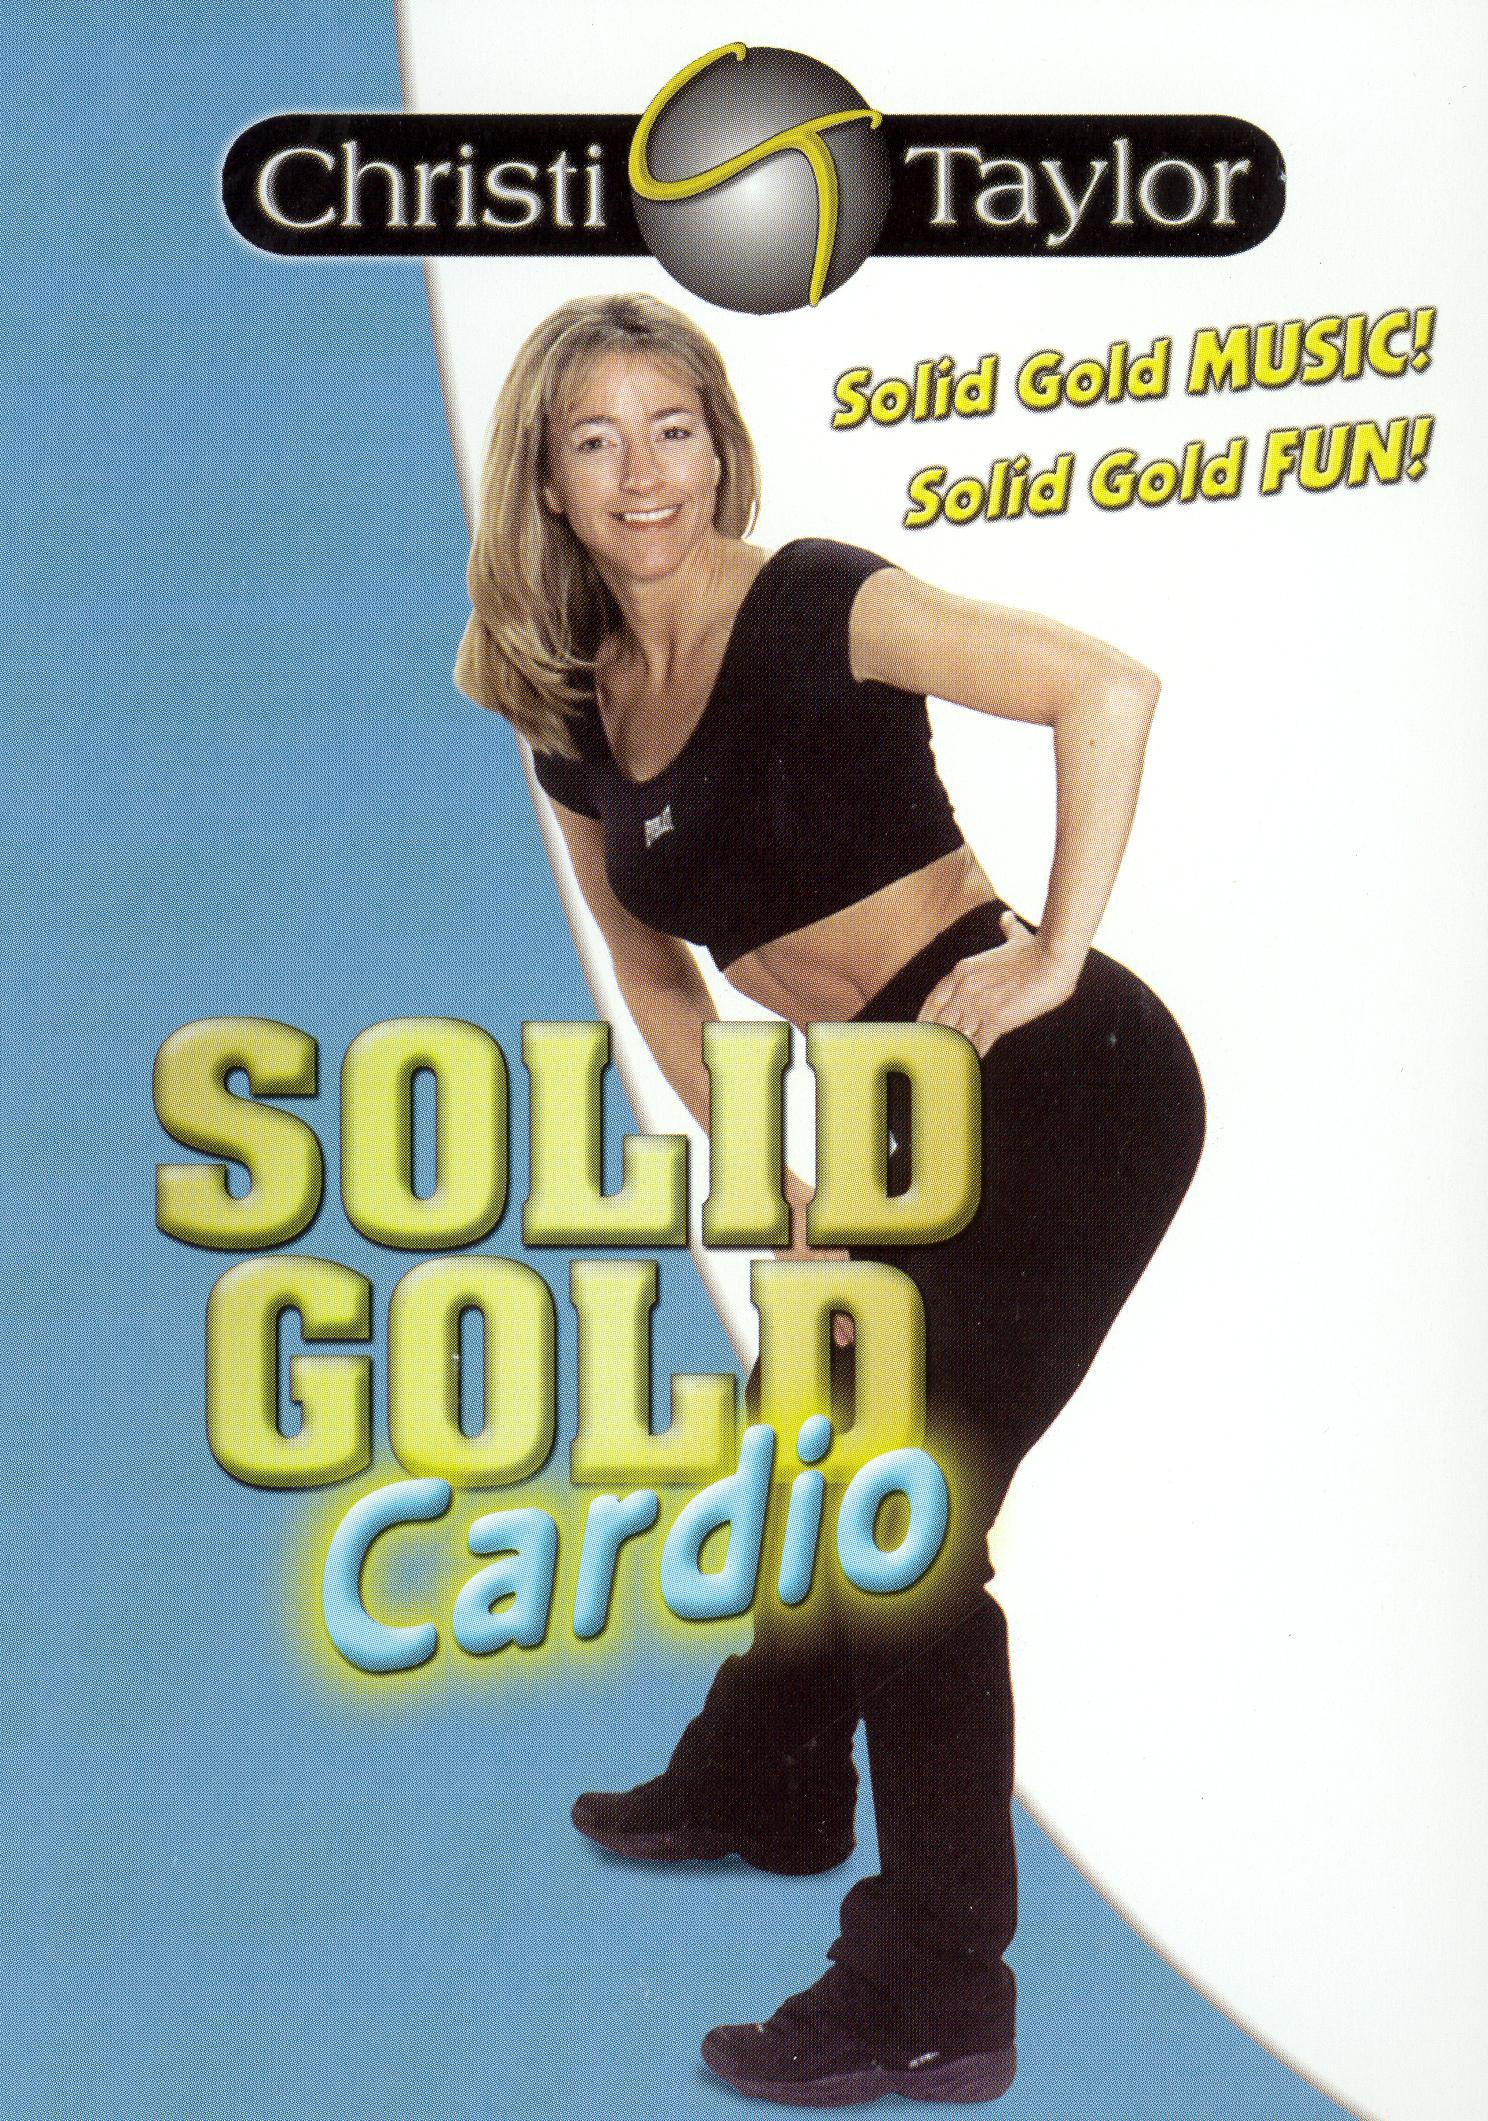 Christi Taylor: Solid Gold Cardio